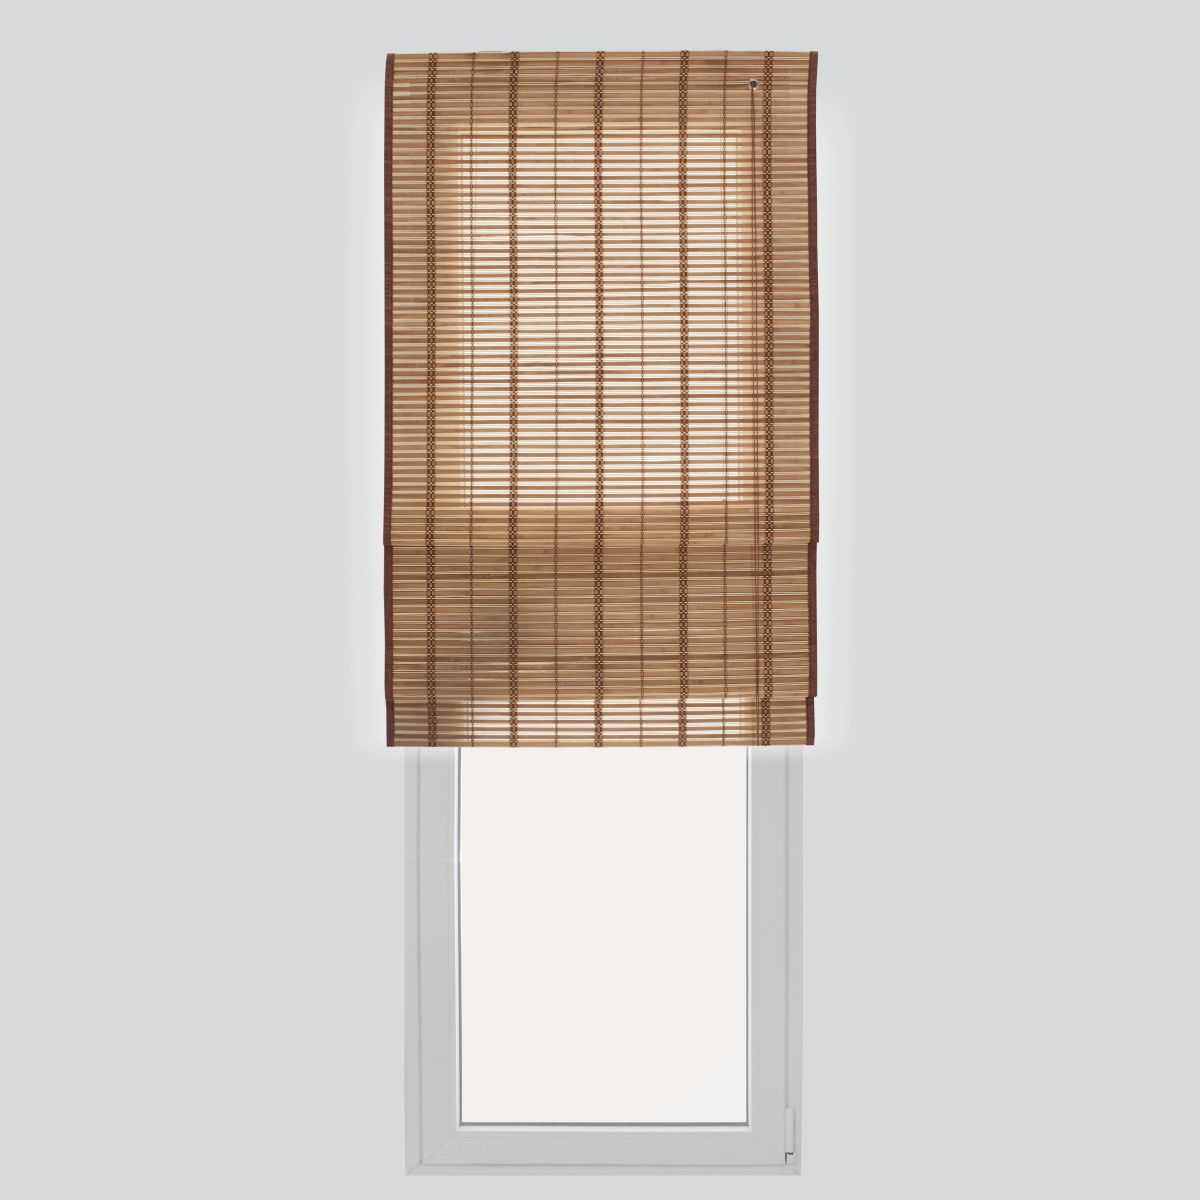 Tenda a pacchetto saigon legno naturale 90 x 250 cm for Leroy merlin copriwater